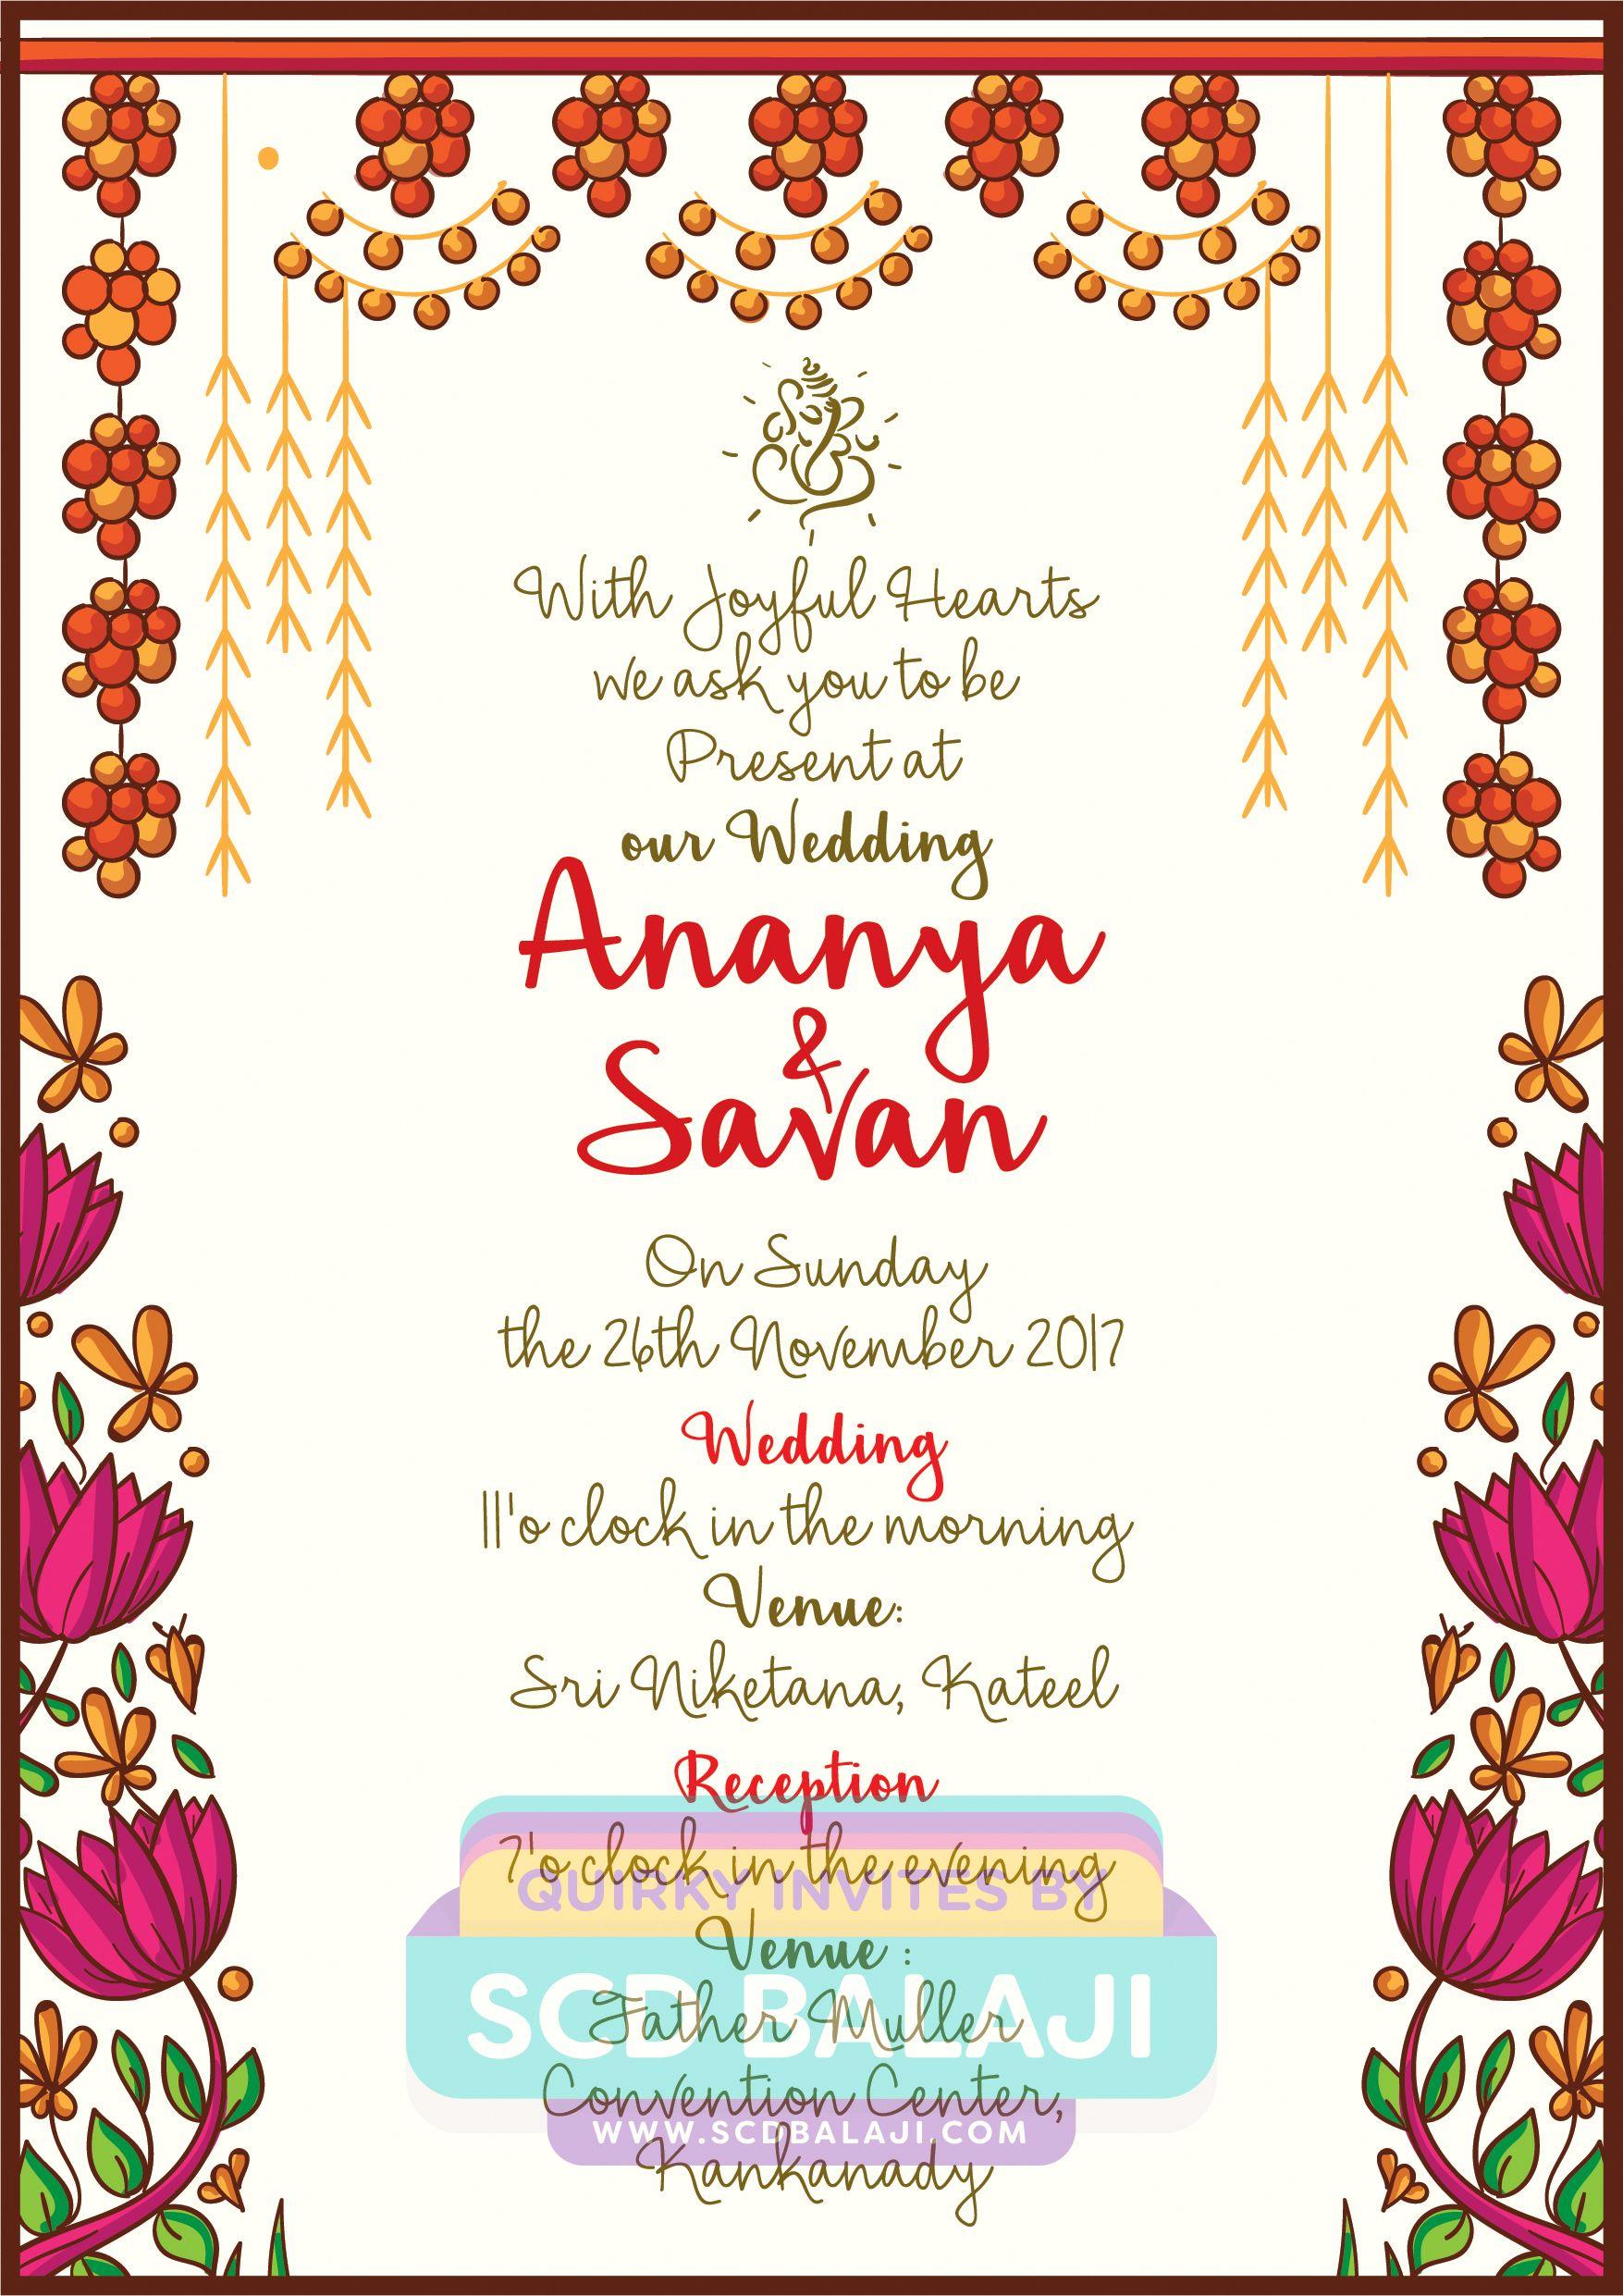 This Creative Mangalore Wedding Invitation Features The Illustration Of A Wedding Invitation Design Indian Wedding Invitation Cards Indian Wedding Invitations